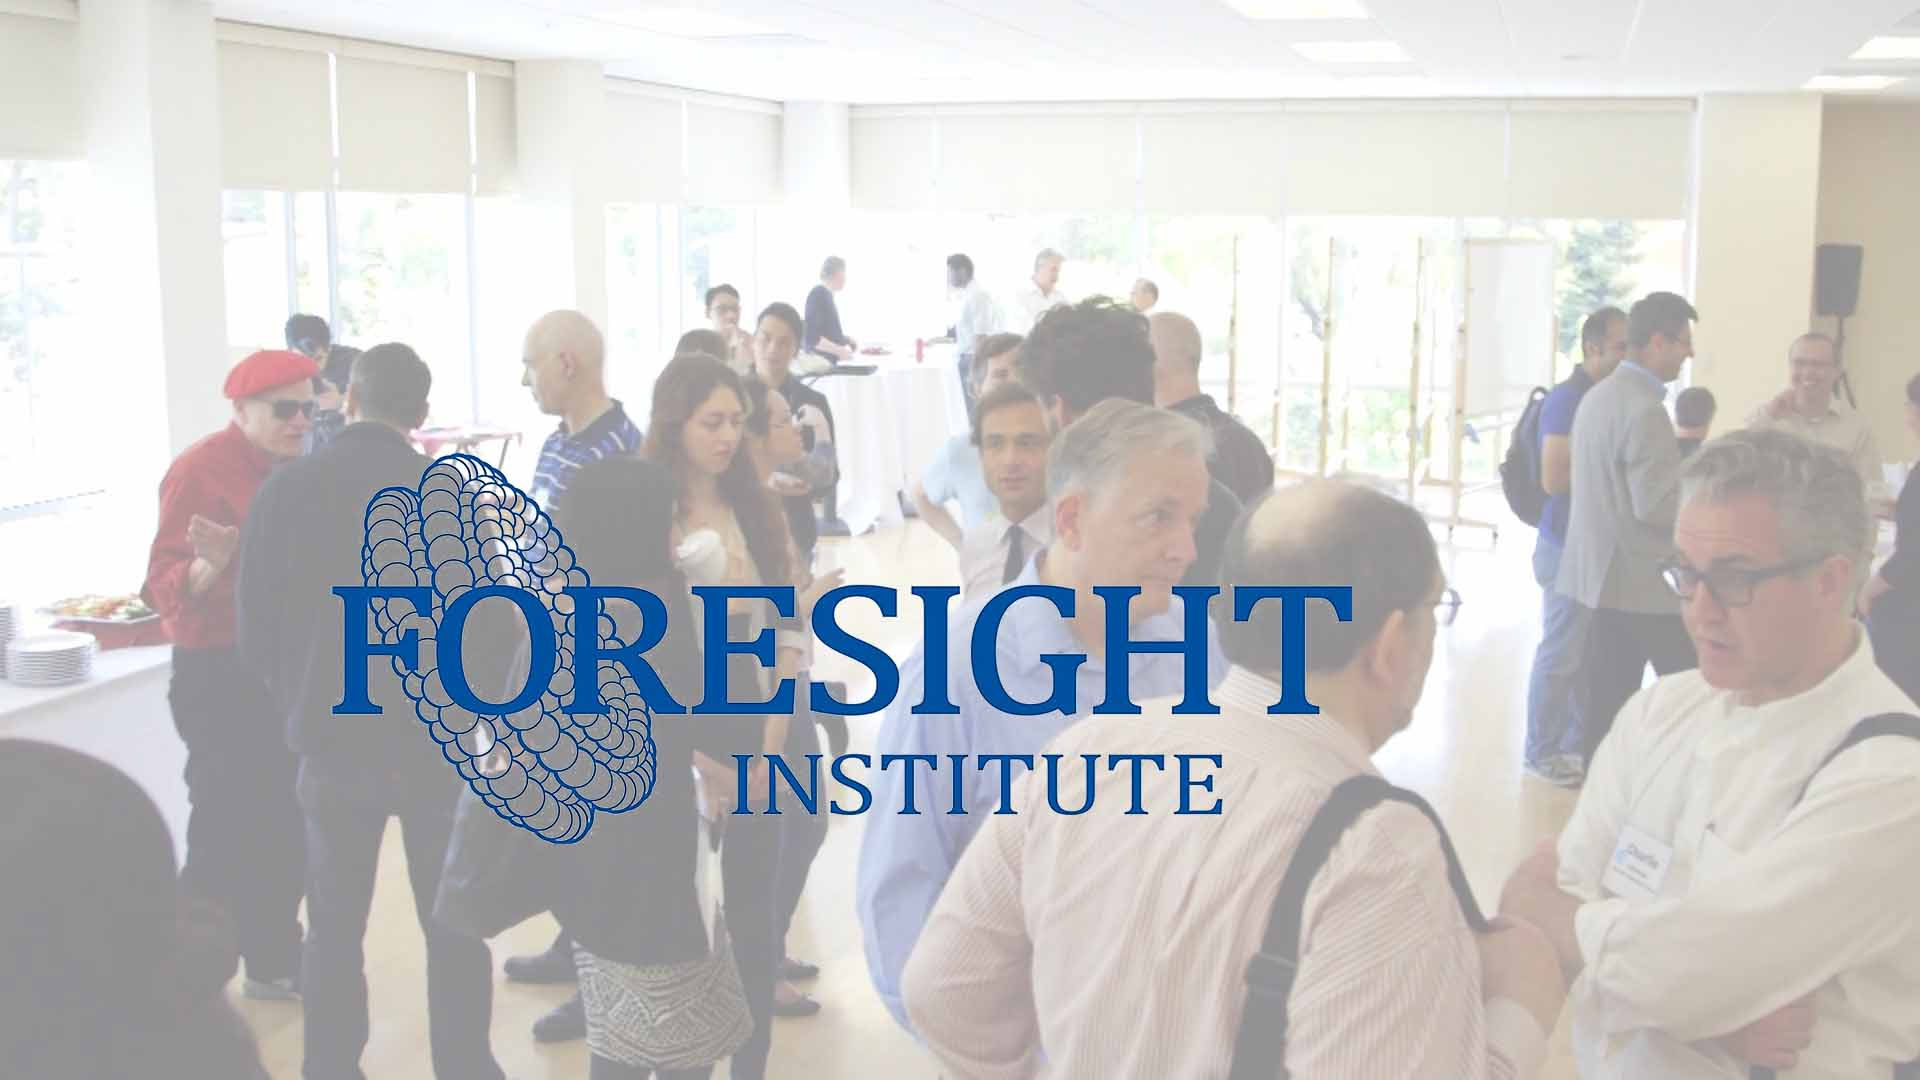 Nanotechnology - Foresight Institute